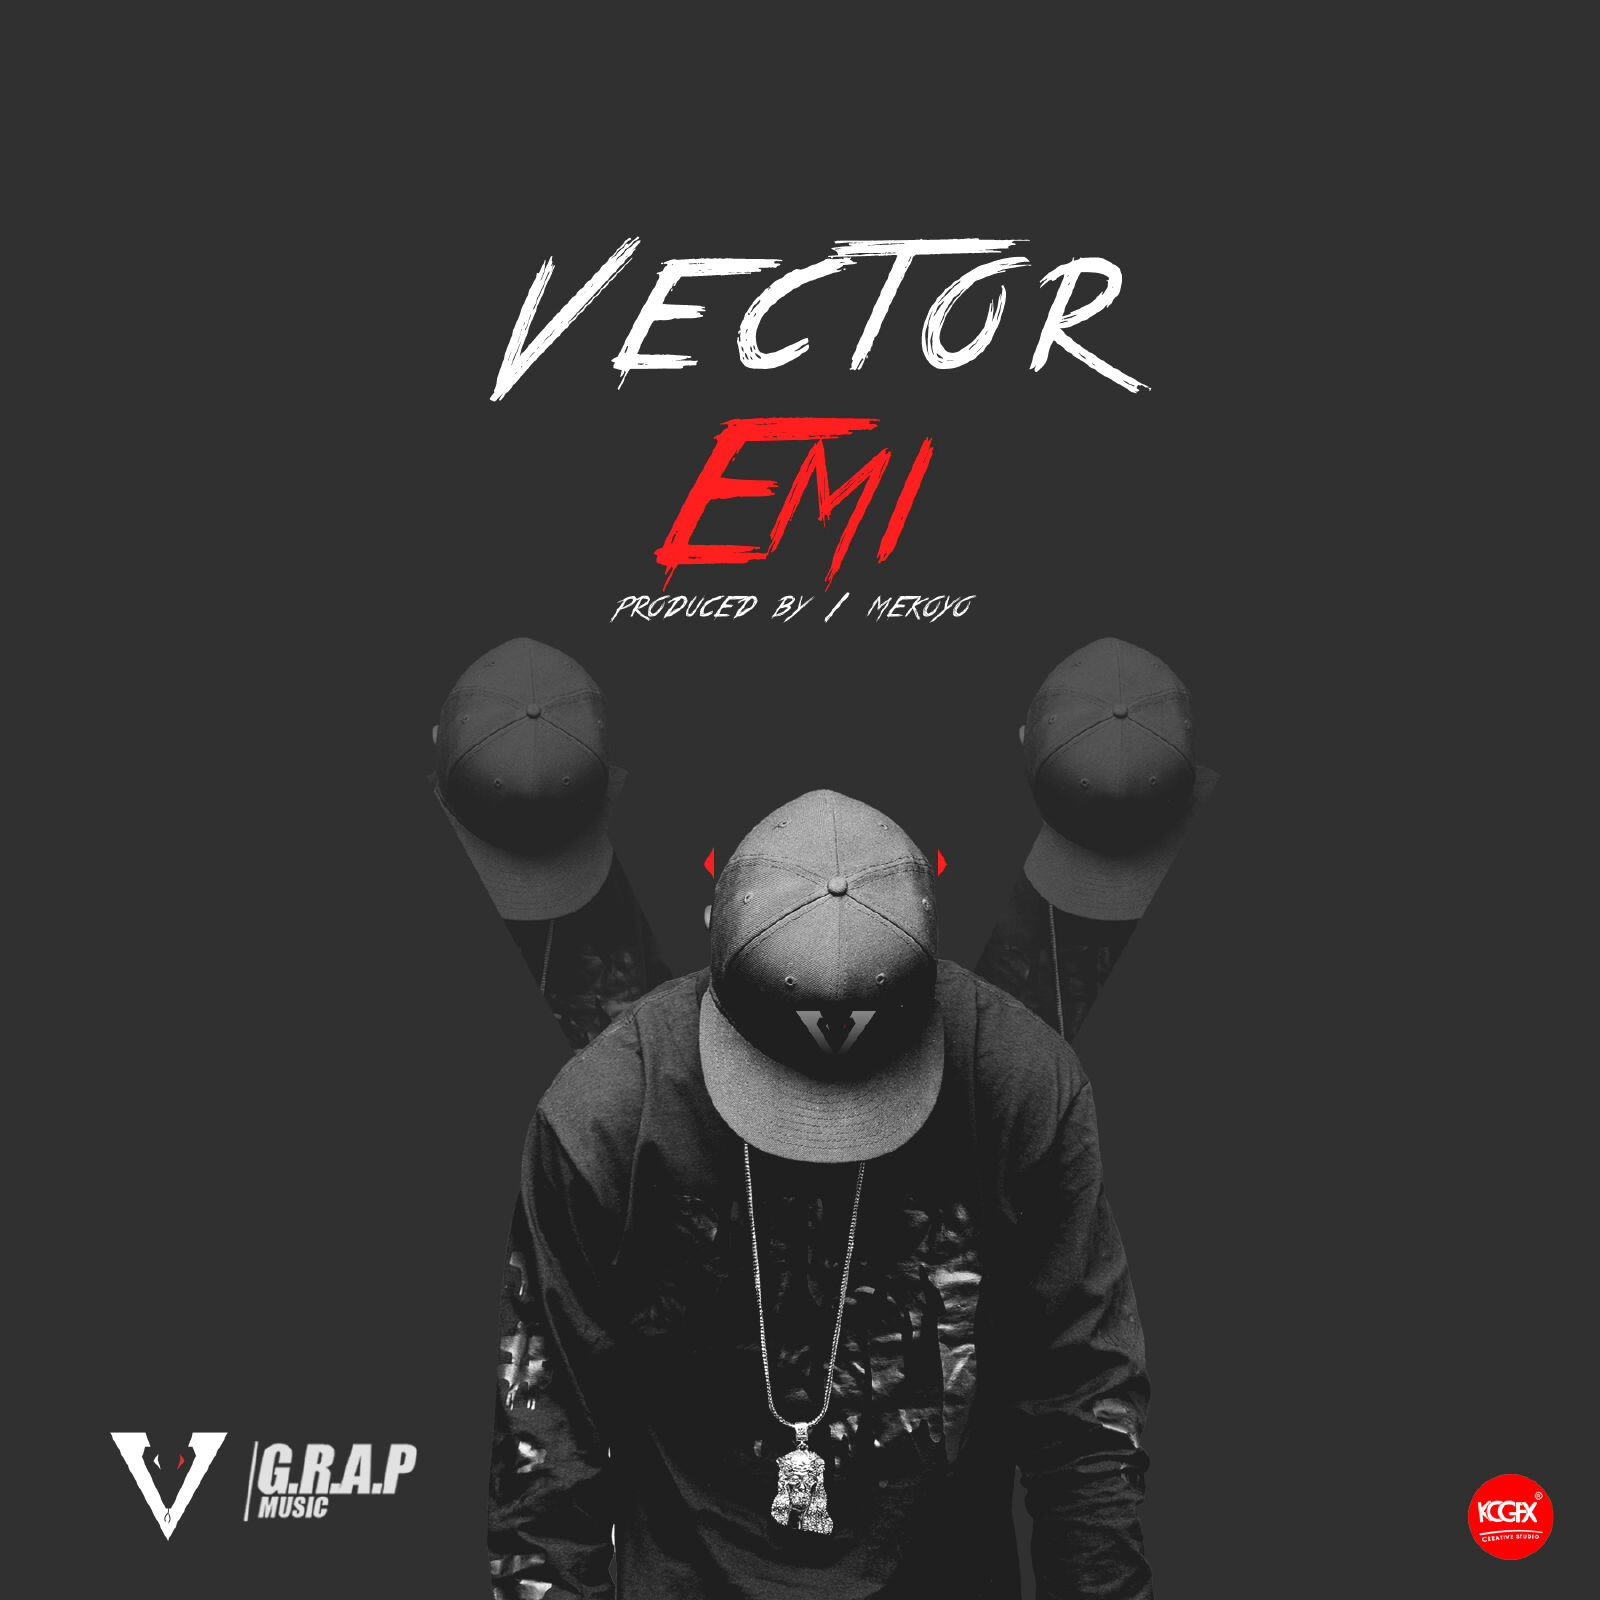 VECTOR_NOVICE2STAR